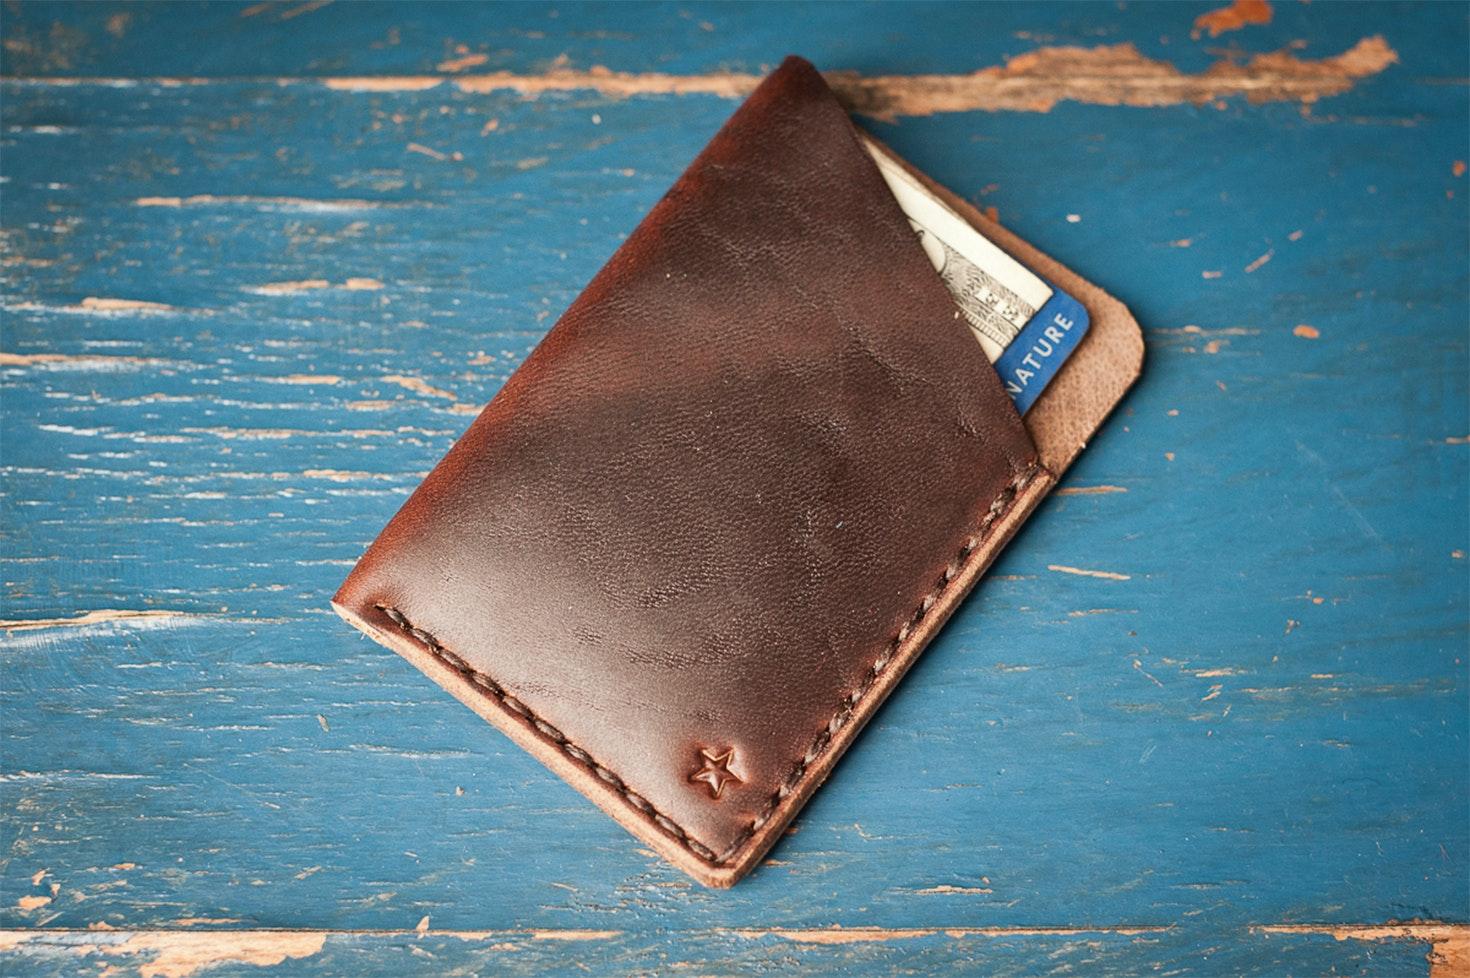 One Star Minimalist Leather Wallet